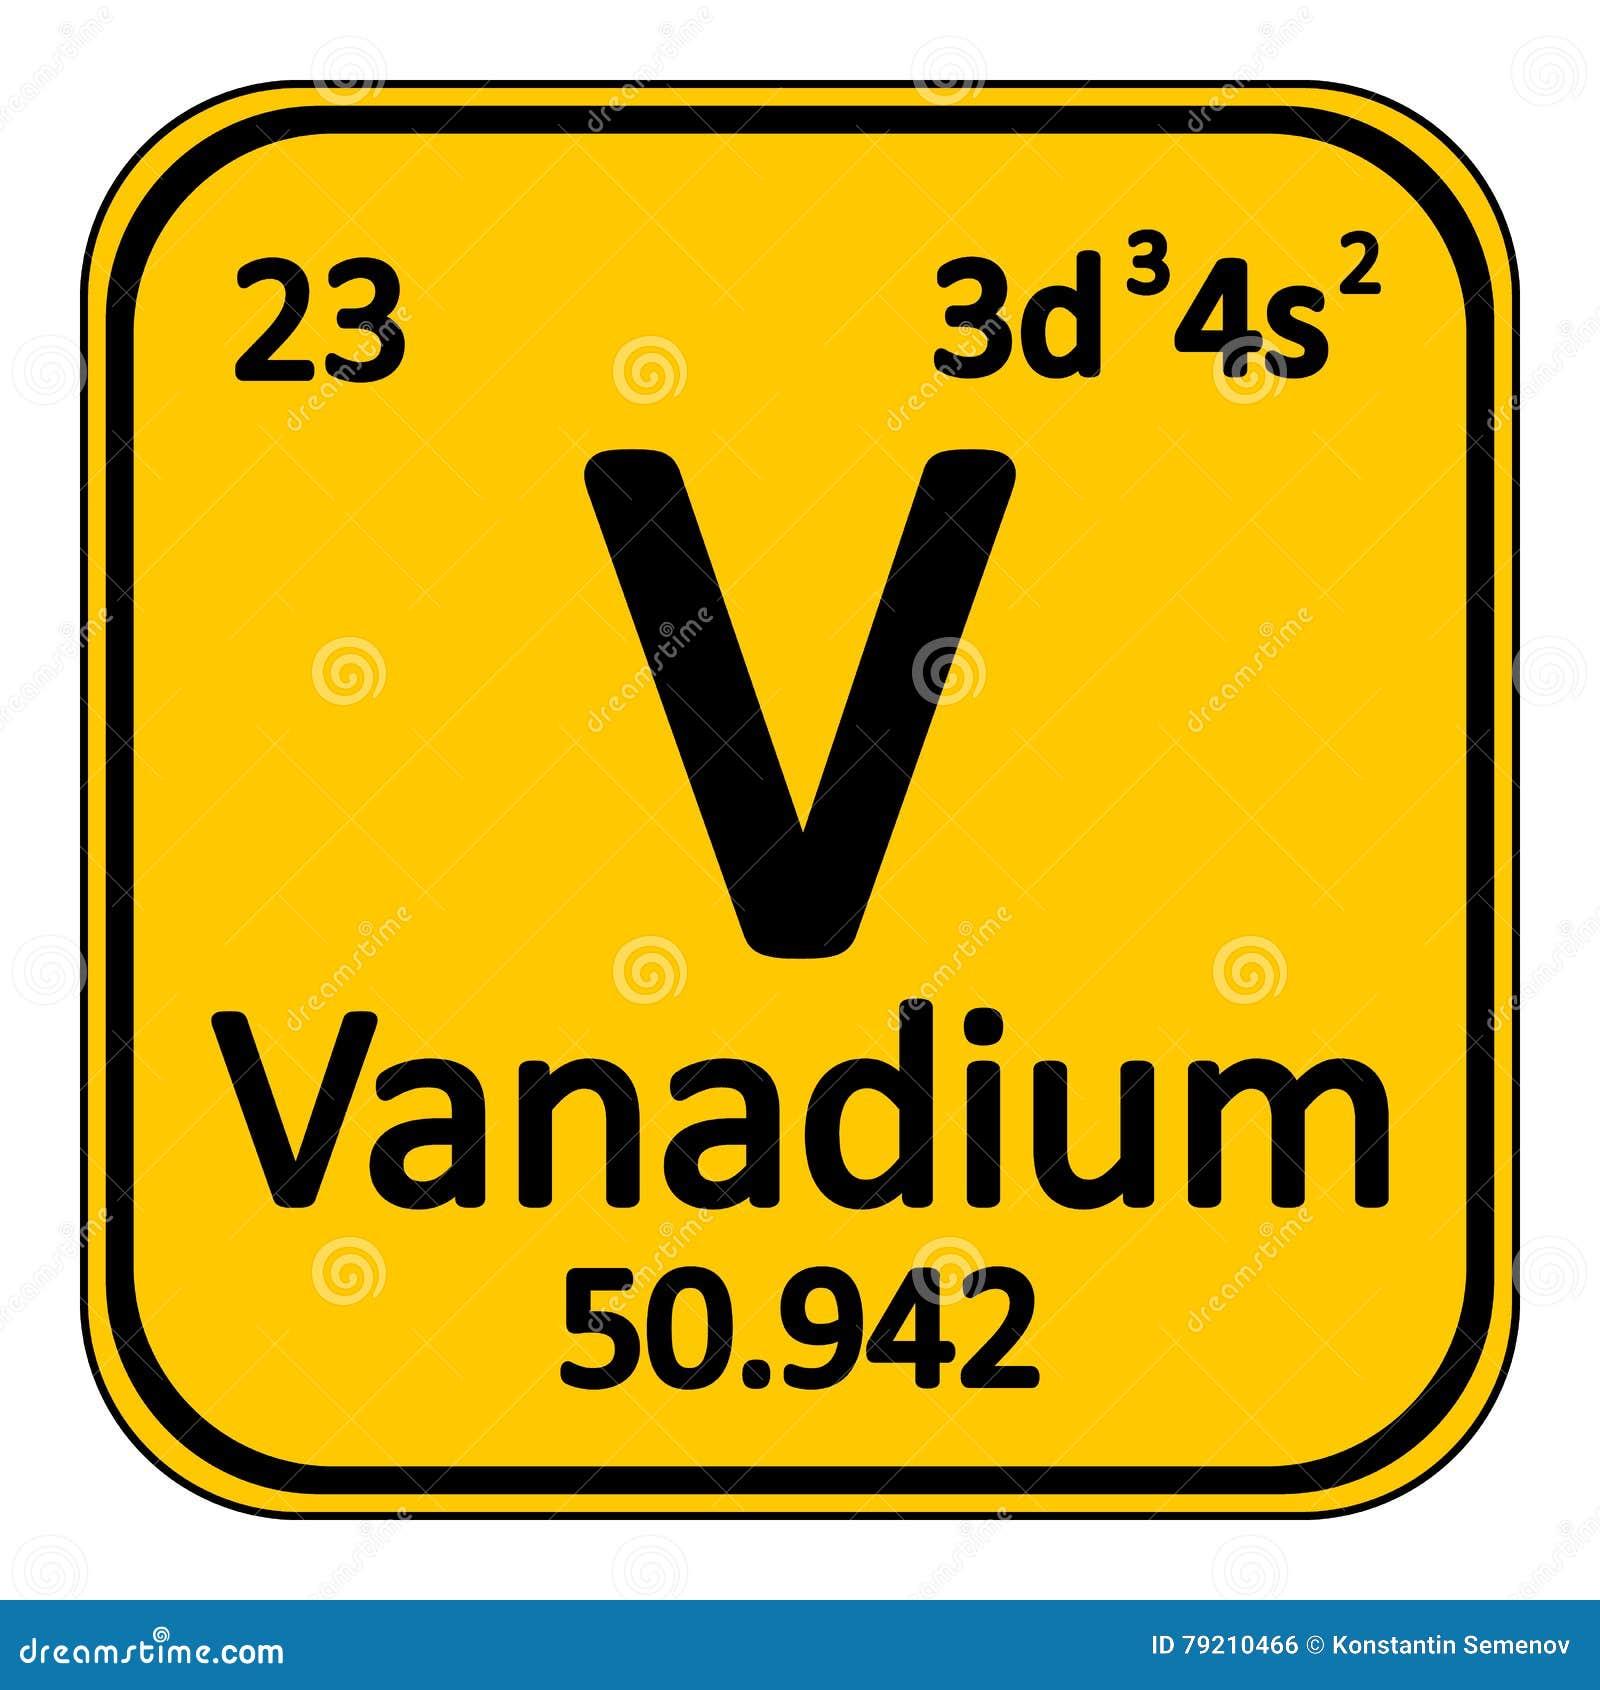 Periodic table element vanadium icon stock illustration image royalty free illustration download periodic table gamestrikefo Images